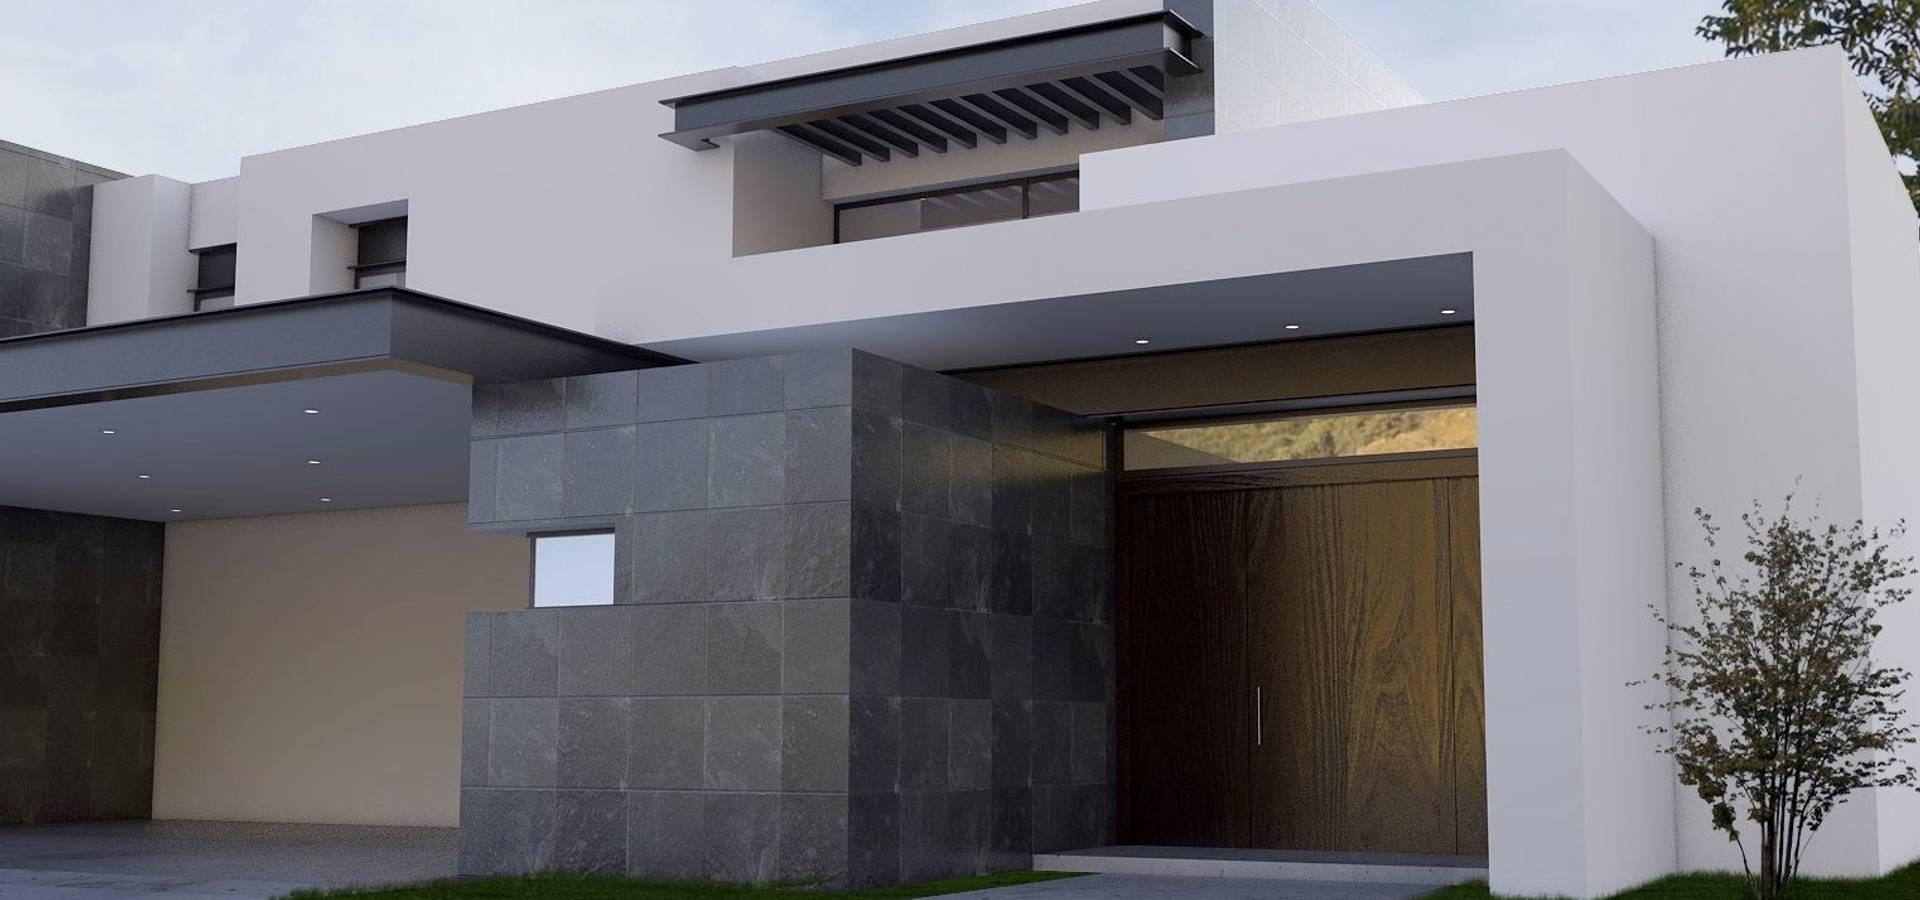 Elias Braun Architecture: Arquitectos en Hermosillo | homify